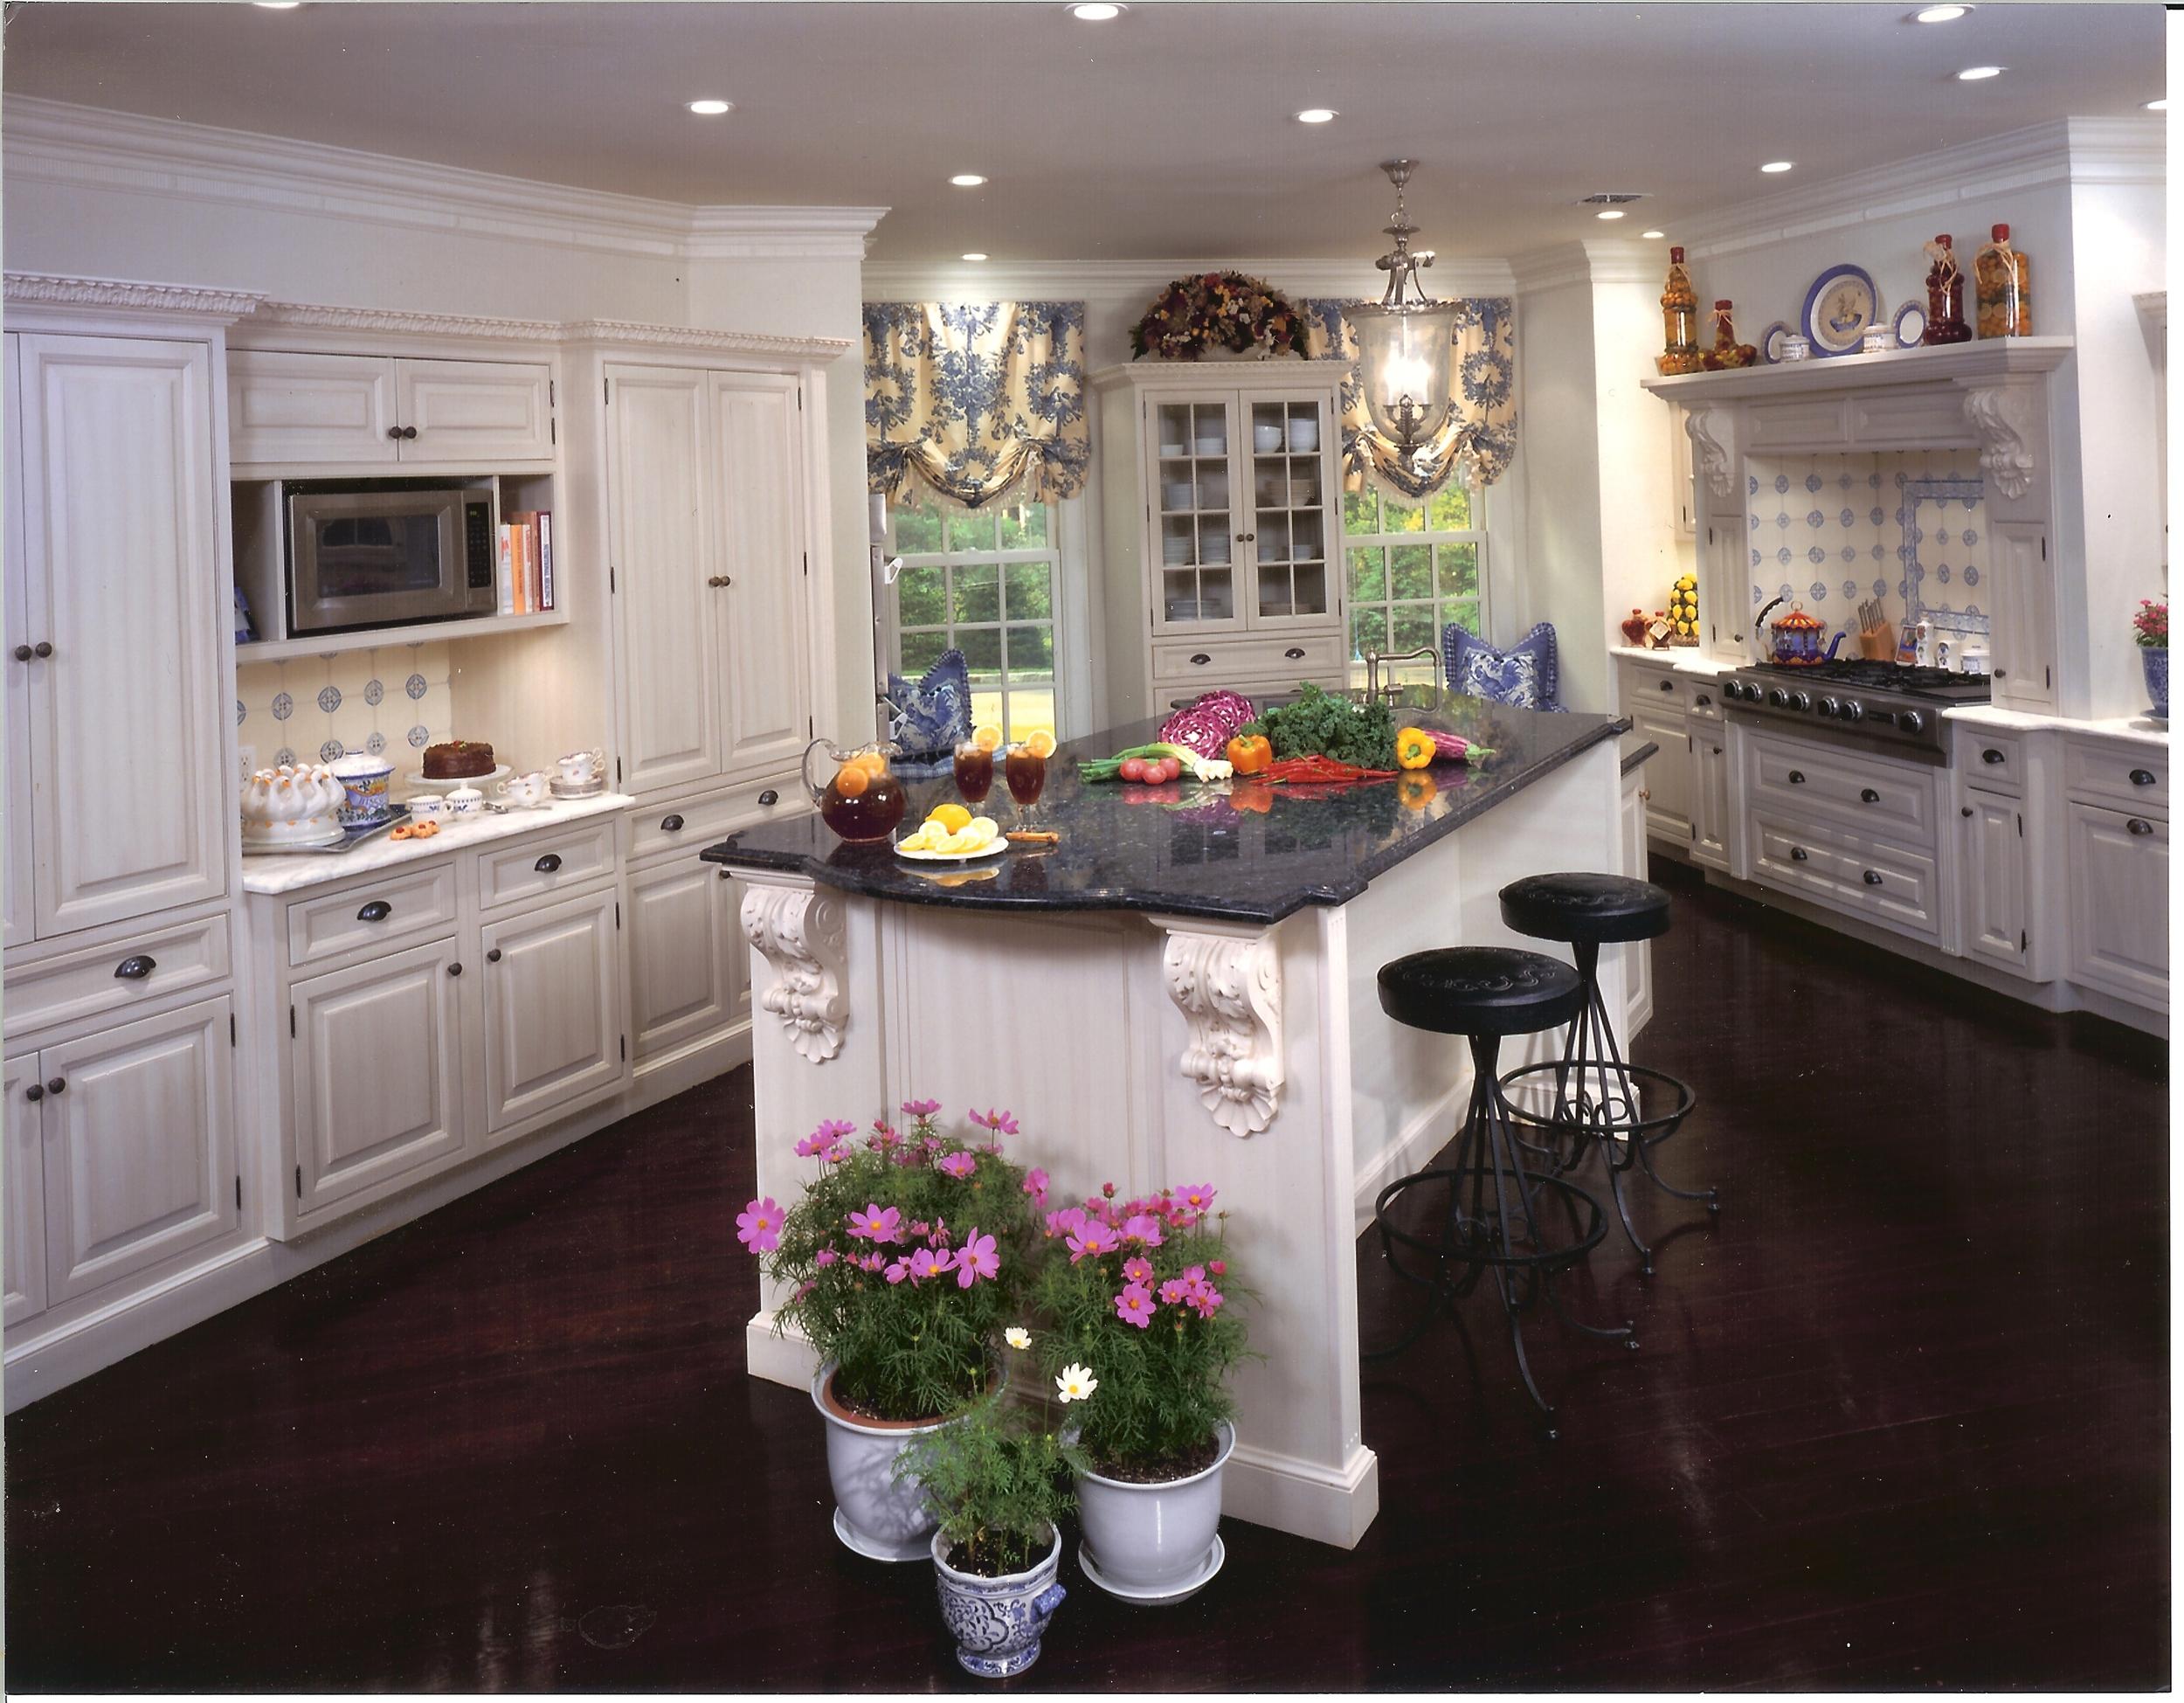 Elite Kitchen & Bath image 5